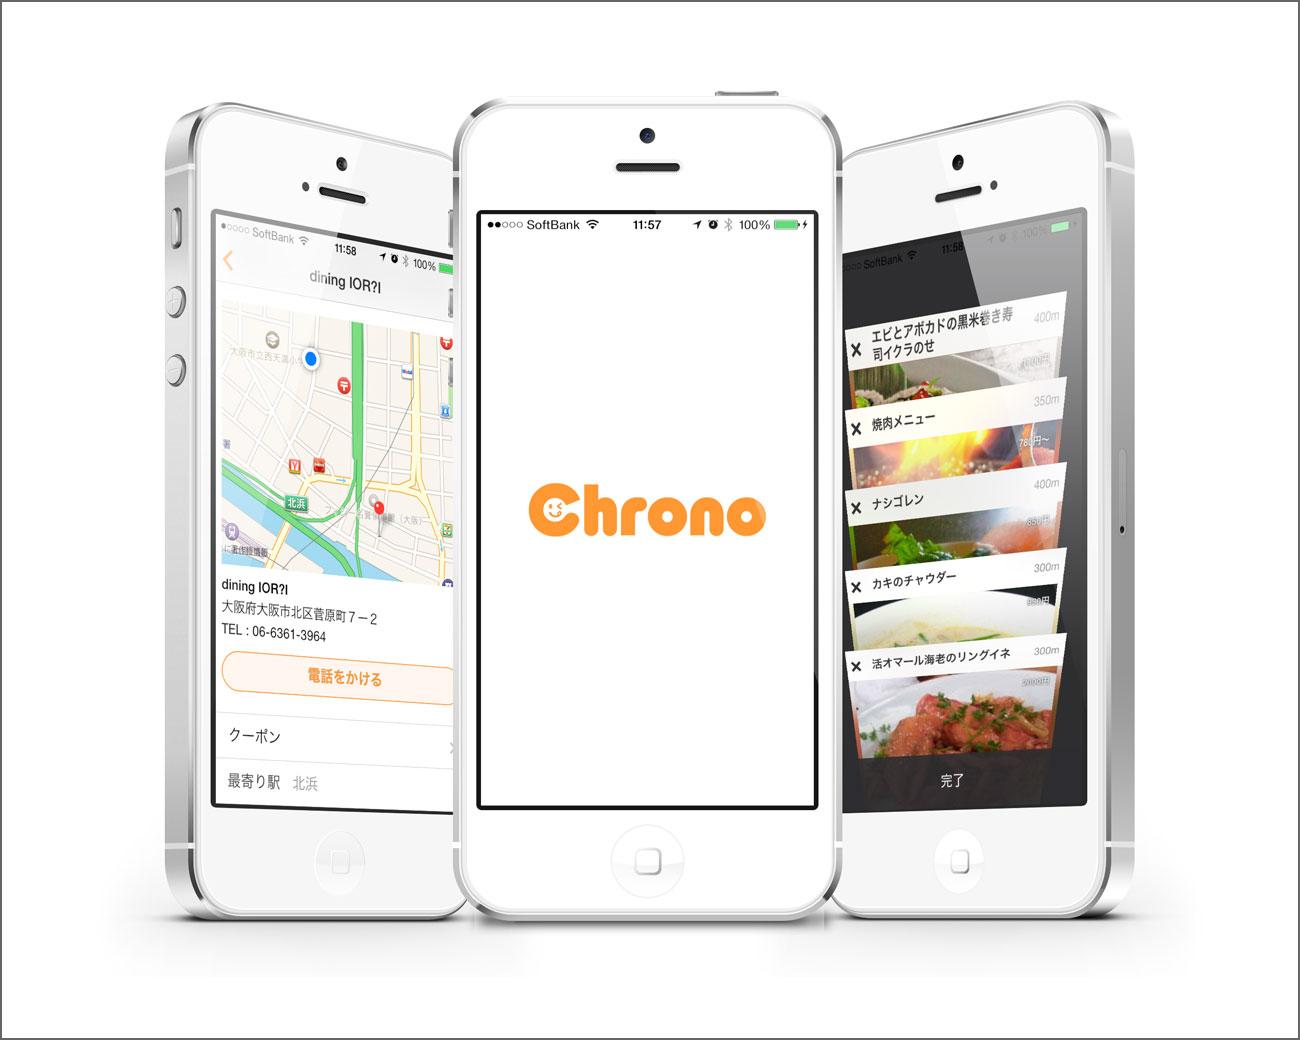 Chrono (クロノ) アプリ スクリーンショット